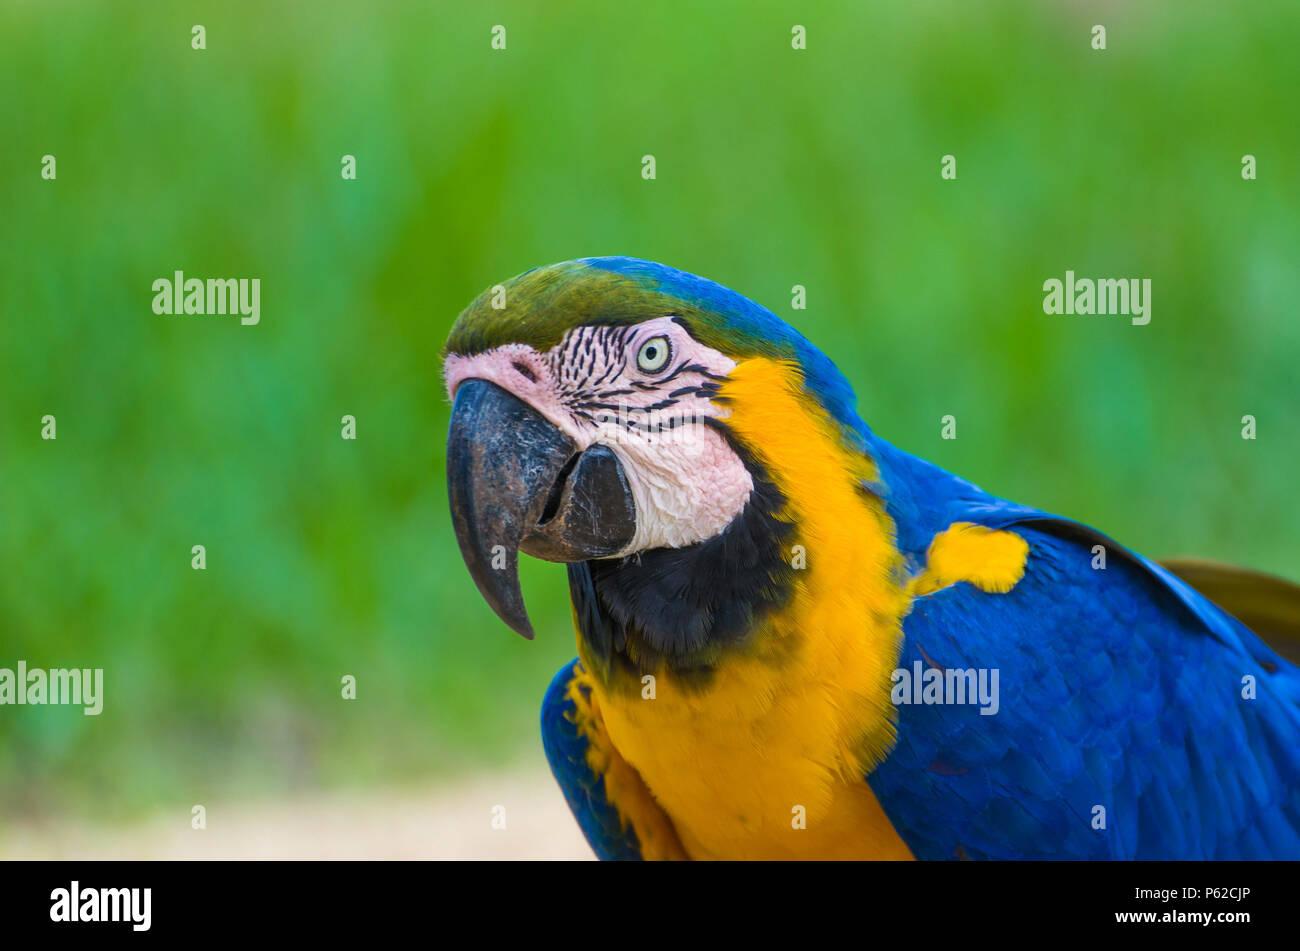 Beautiful Blue-and-yellow Macaw (Ara ararauna) in the Brazilian wetland. Stock Photo